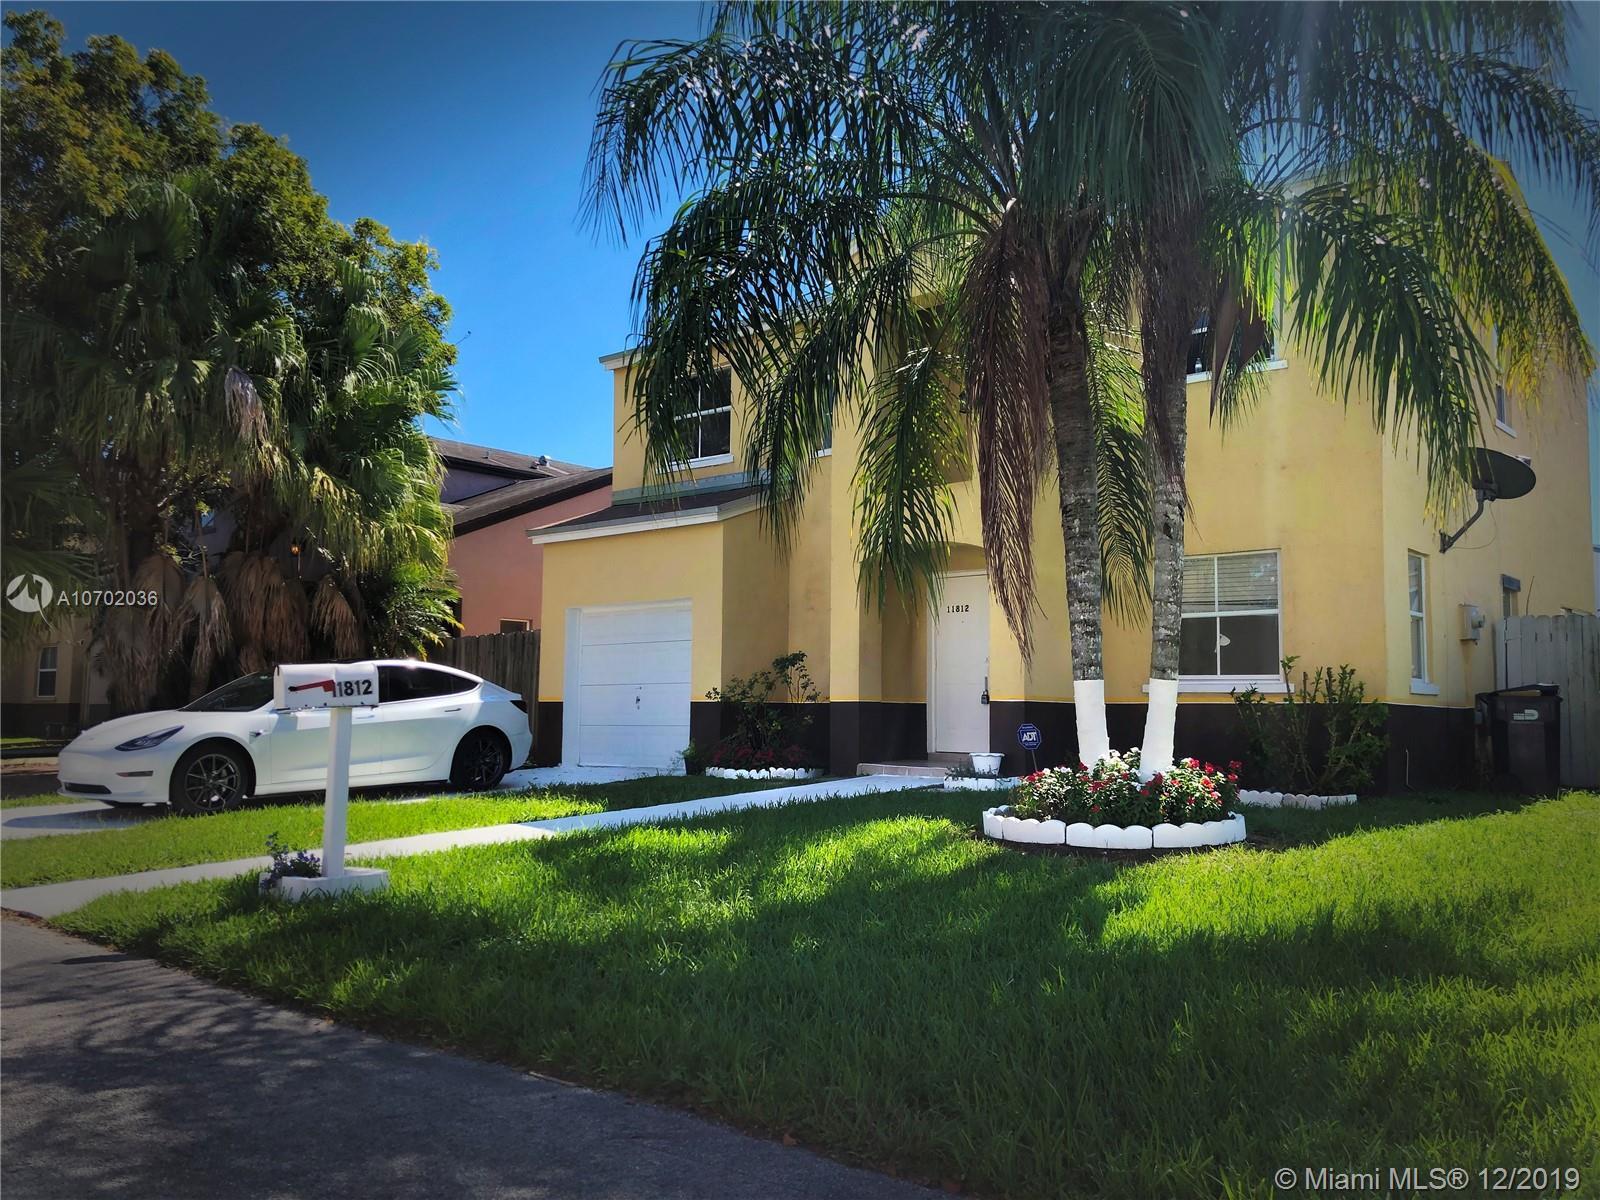 11812 SW 272nd Ter, Homestead, FL 33032 - Homestead, FL real estate listing